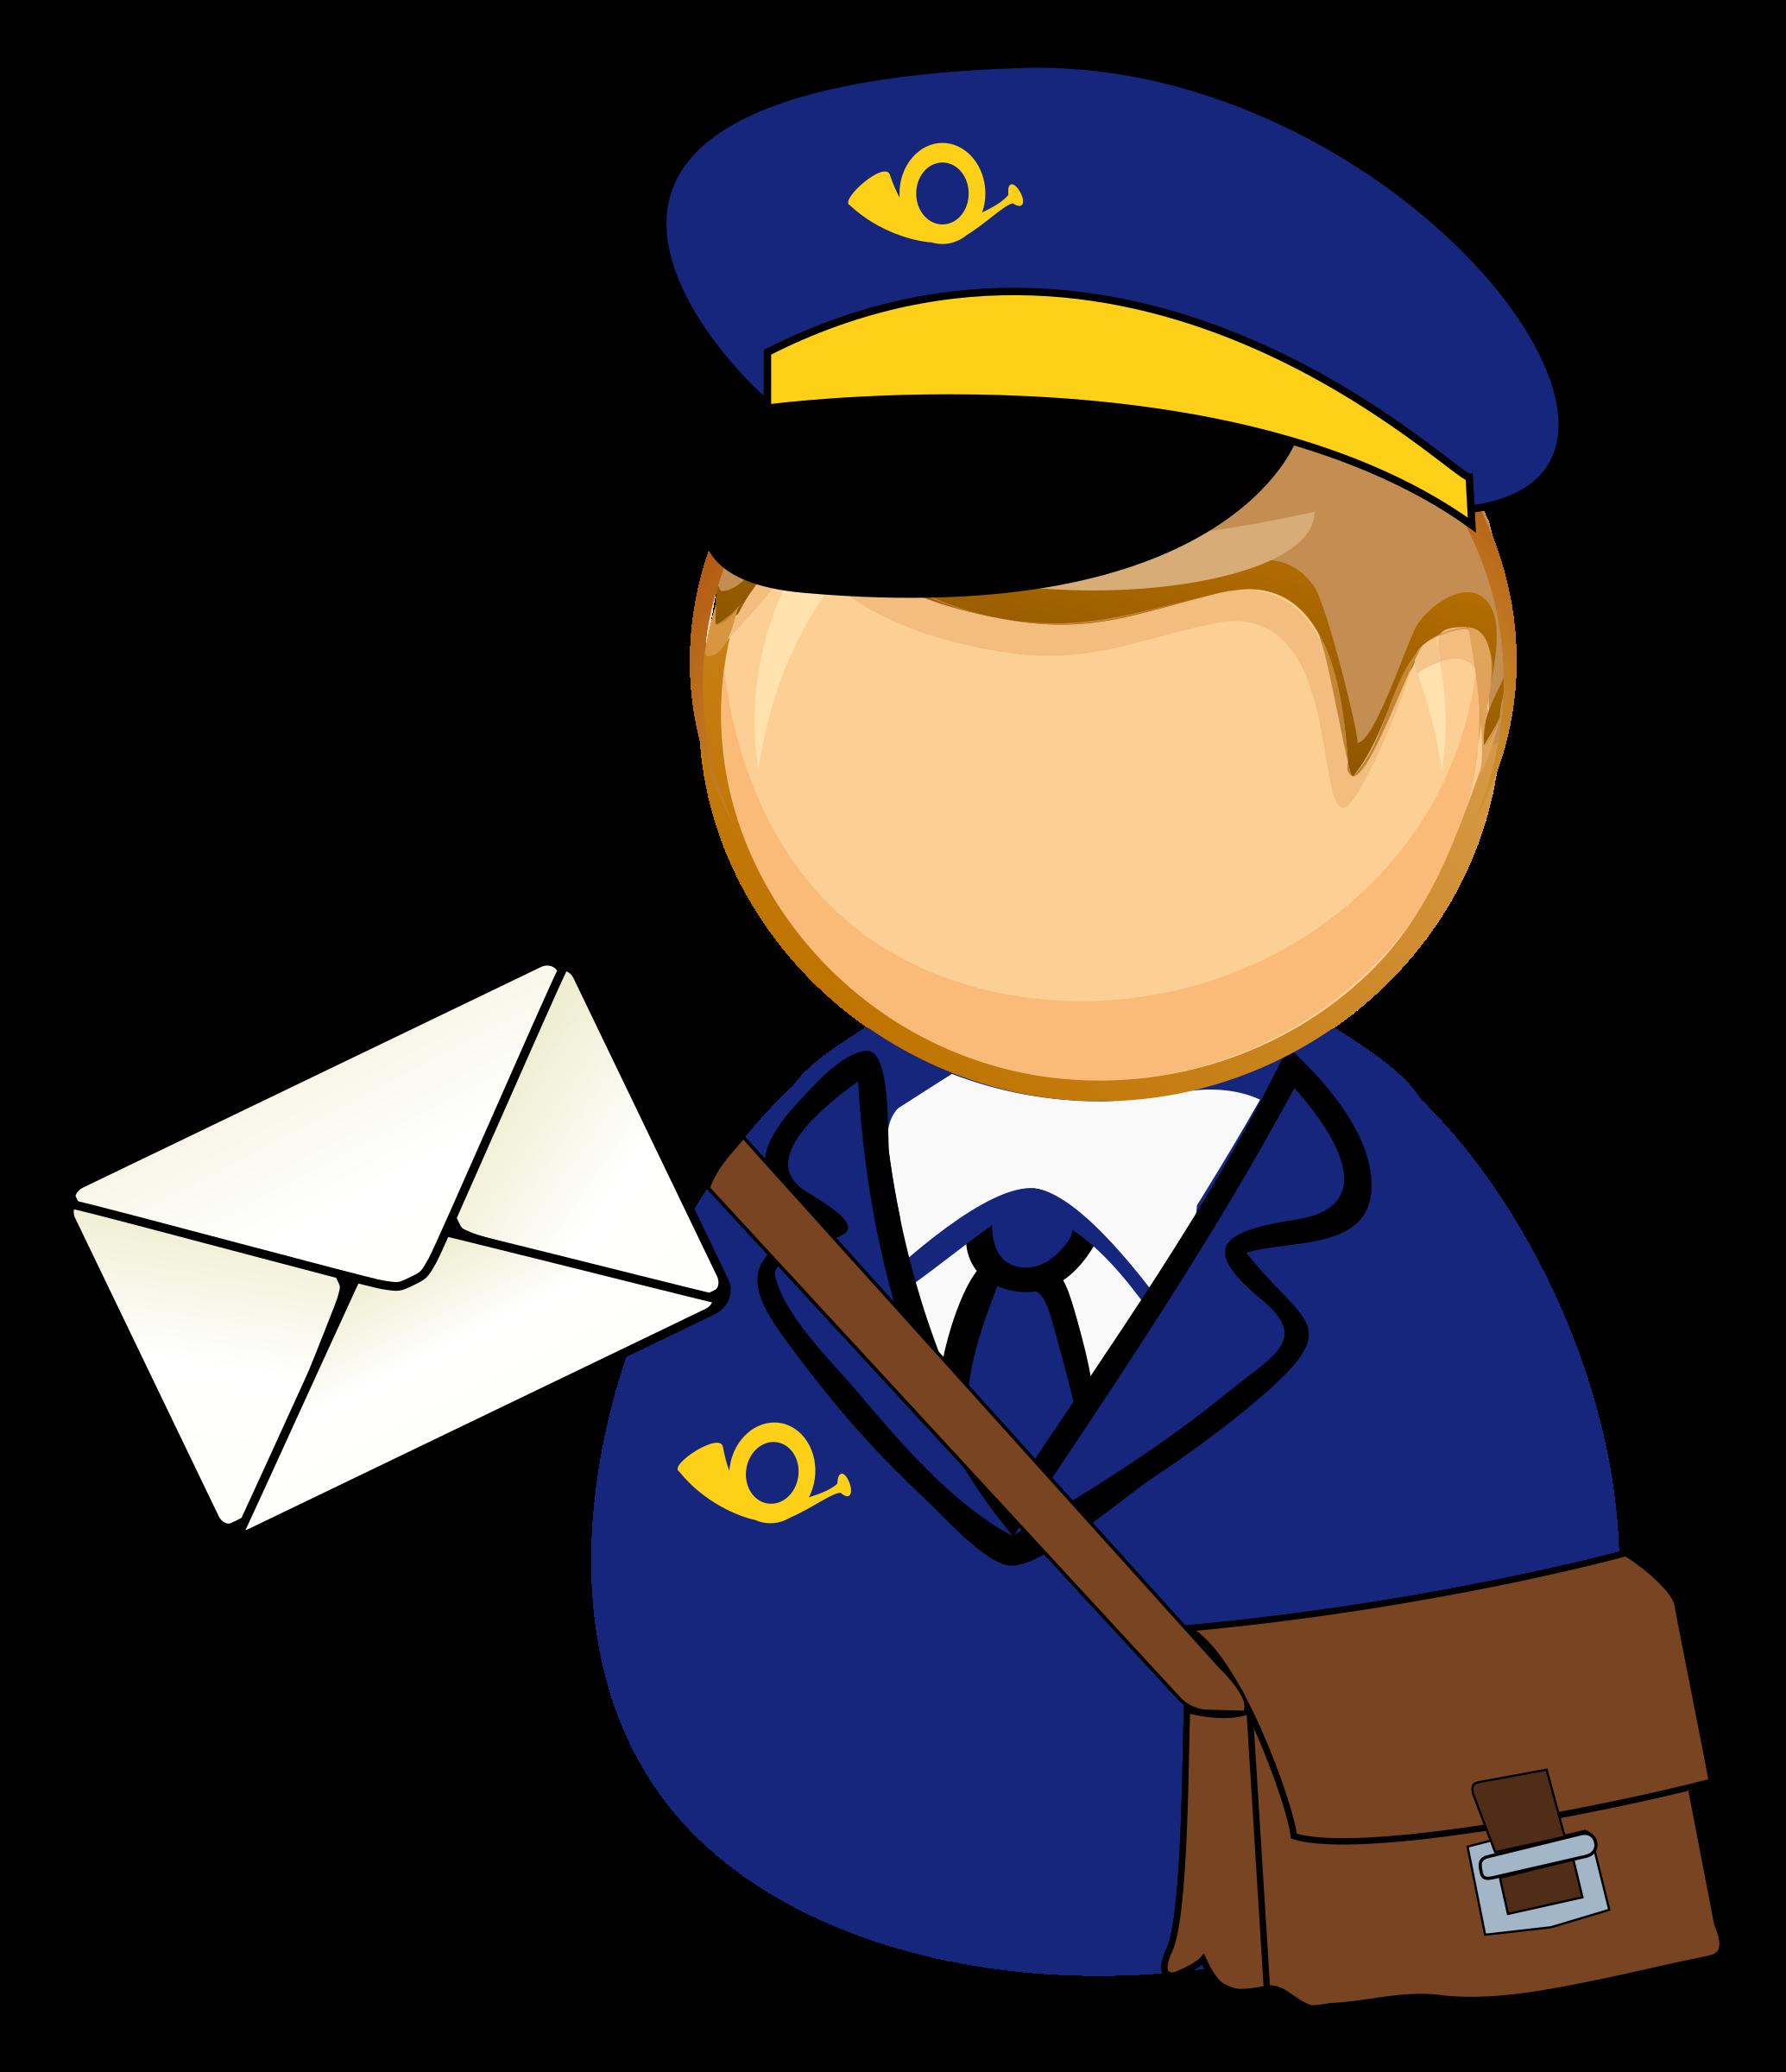 BIG IMAGE (PNG) - PNG Postman